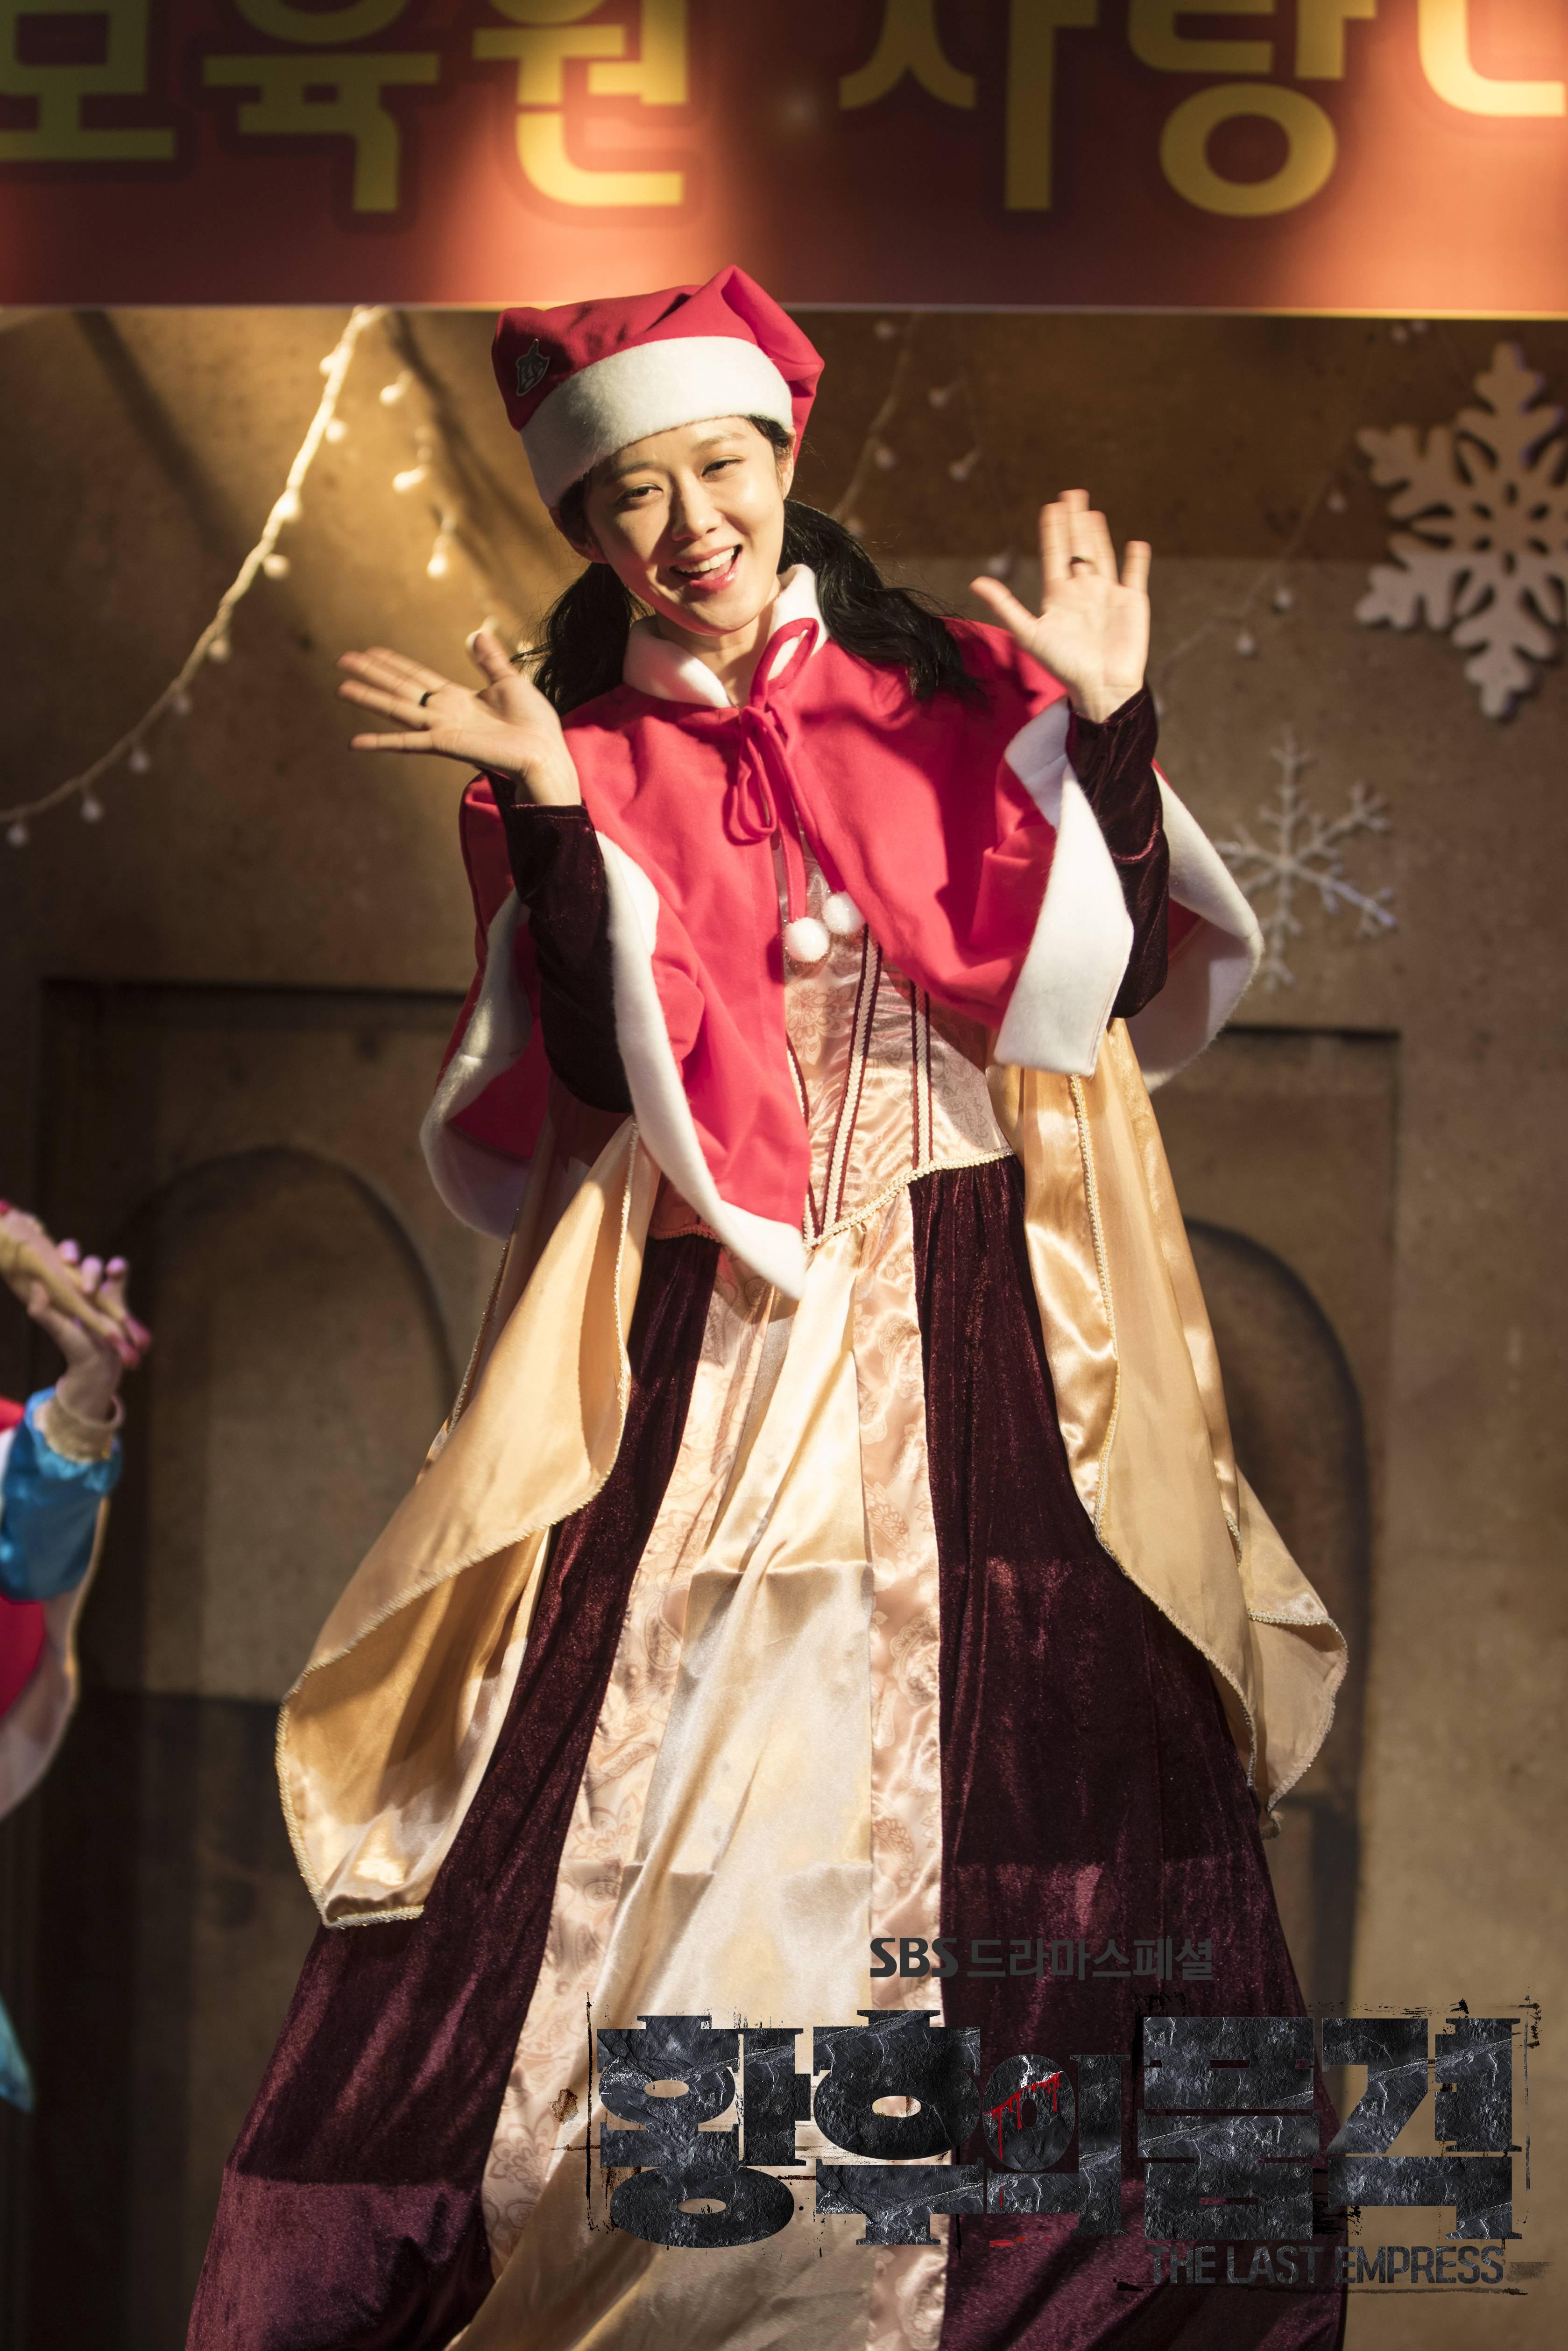 The Last Empress (Korean Drama - 2018) - 황후의 품격